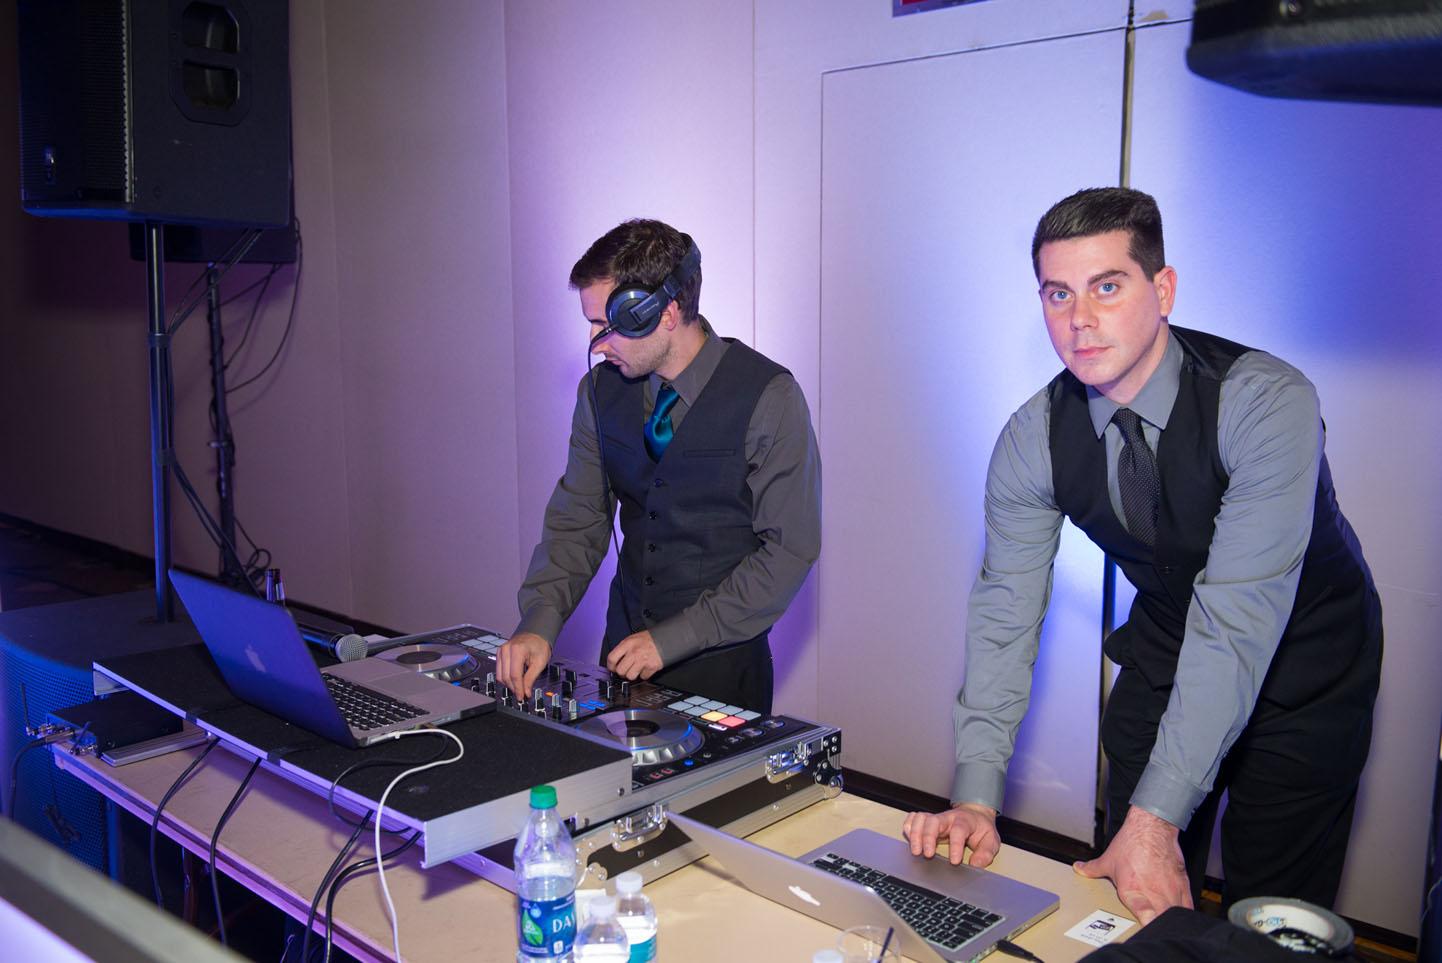 2015-12-09 ReMax Corpoarte Event - The Borgata - Atlantic City NJ - Photo Sesh - 2015-5076.jpg